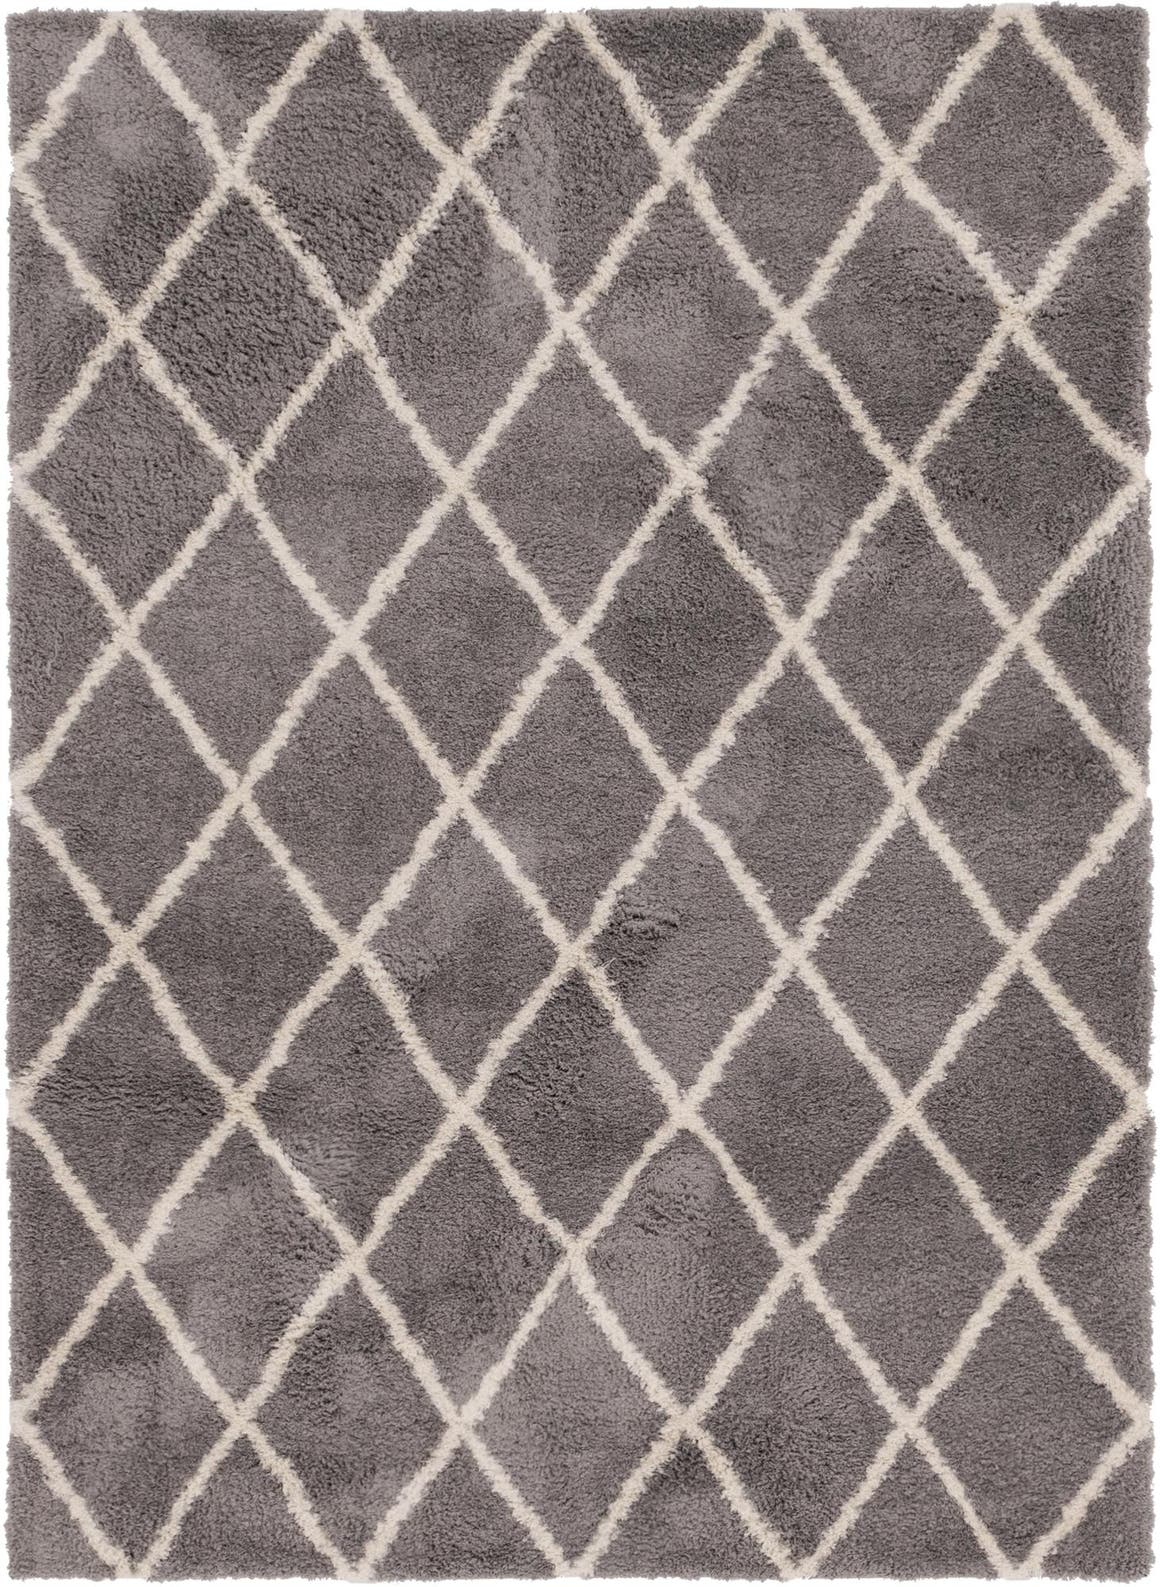 5' x 7' Trellis Shag Rug main image